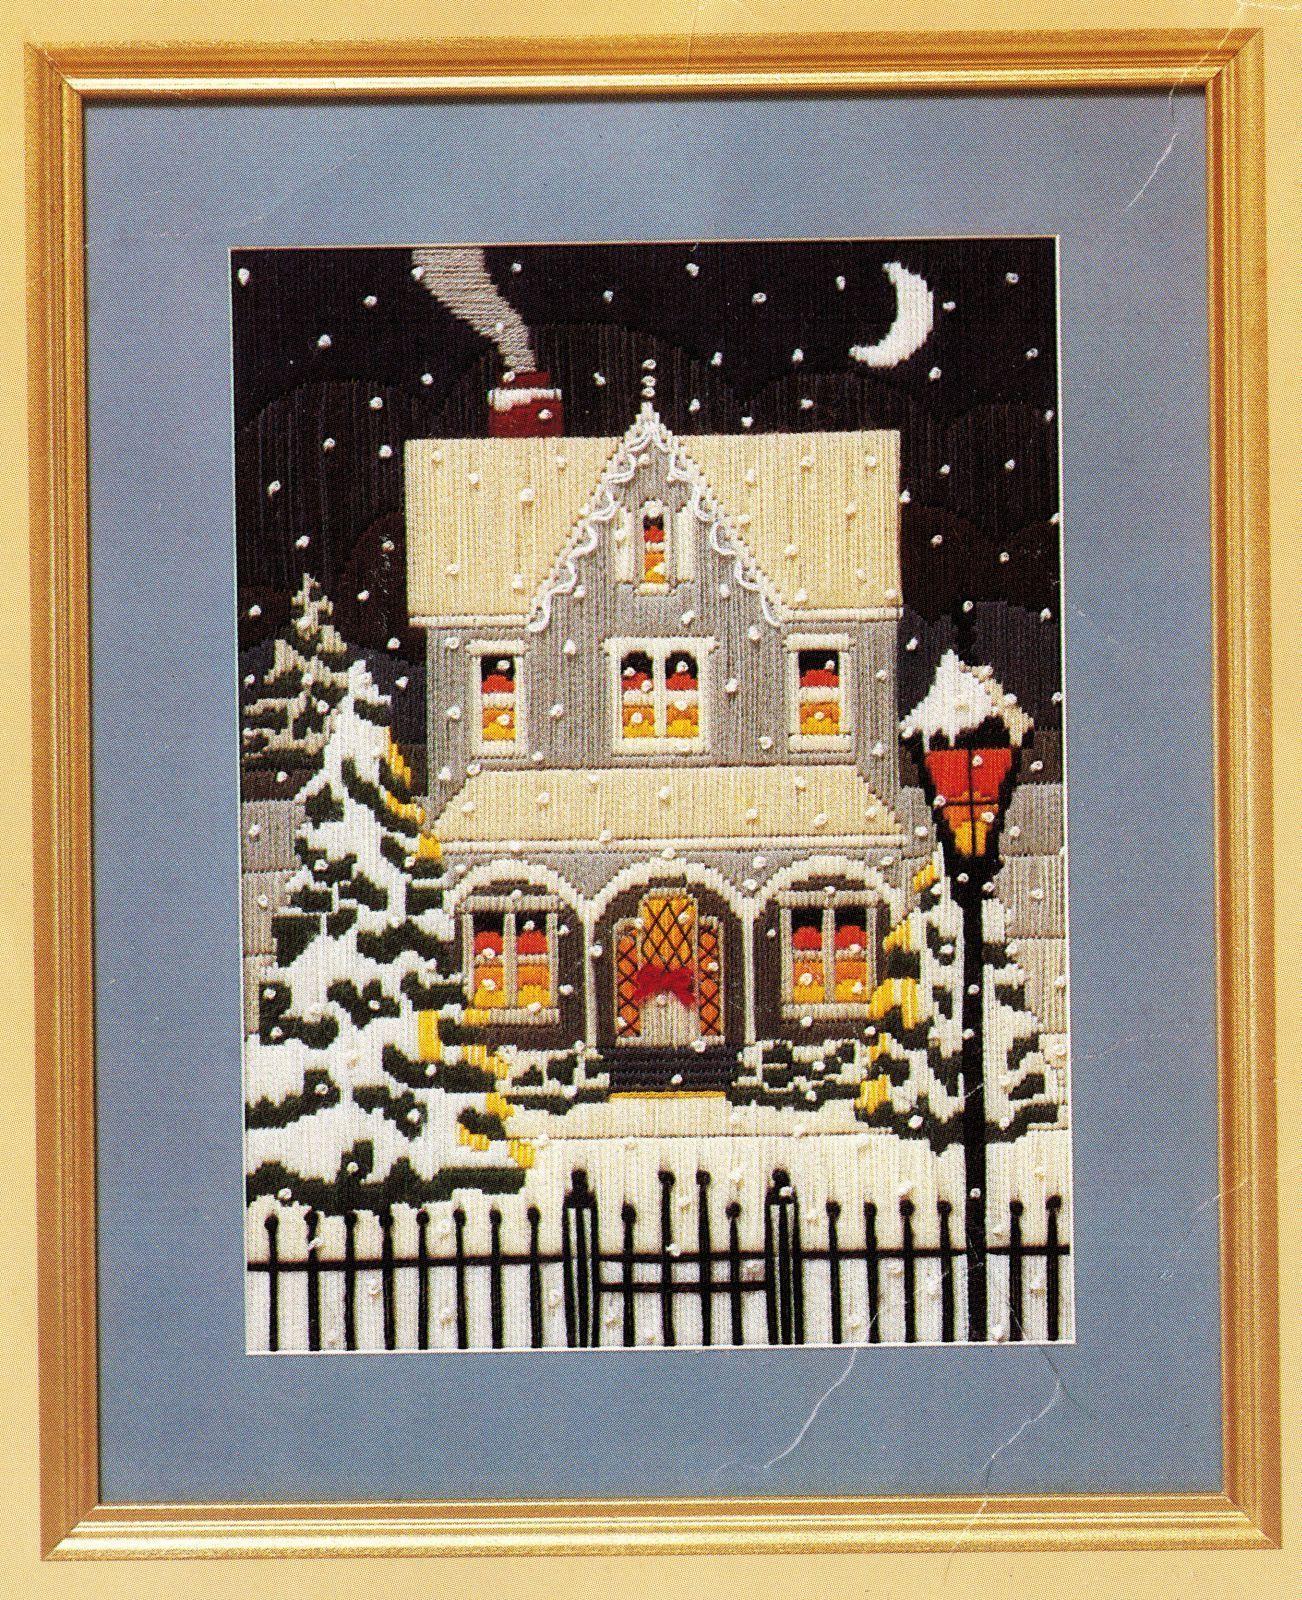 "1986 Creative Circle Needlepoint A Winter's Night Diane Sage Kit 12"" X 16"" - $18.99"